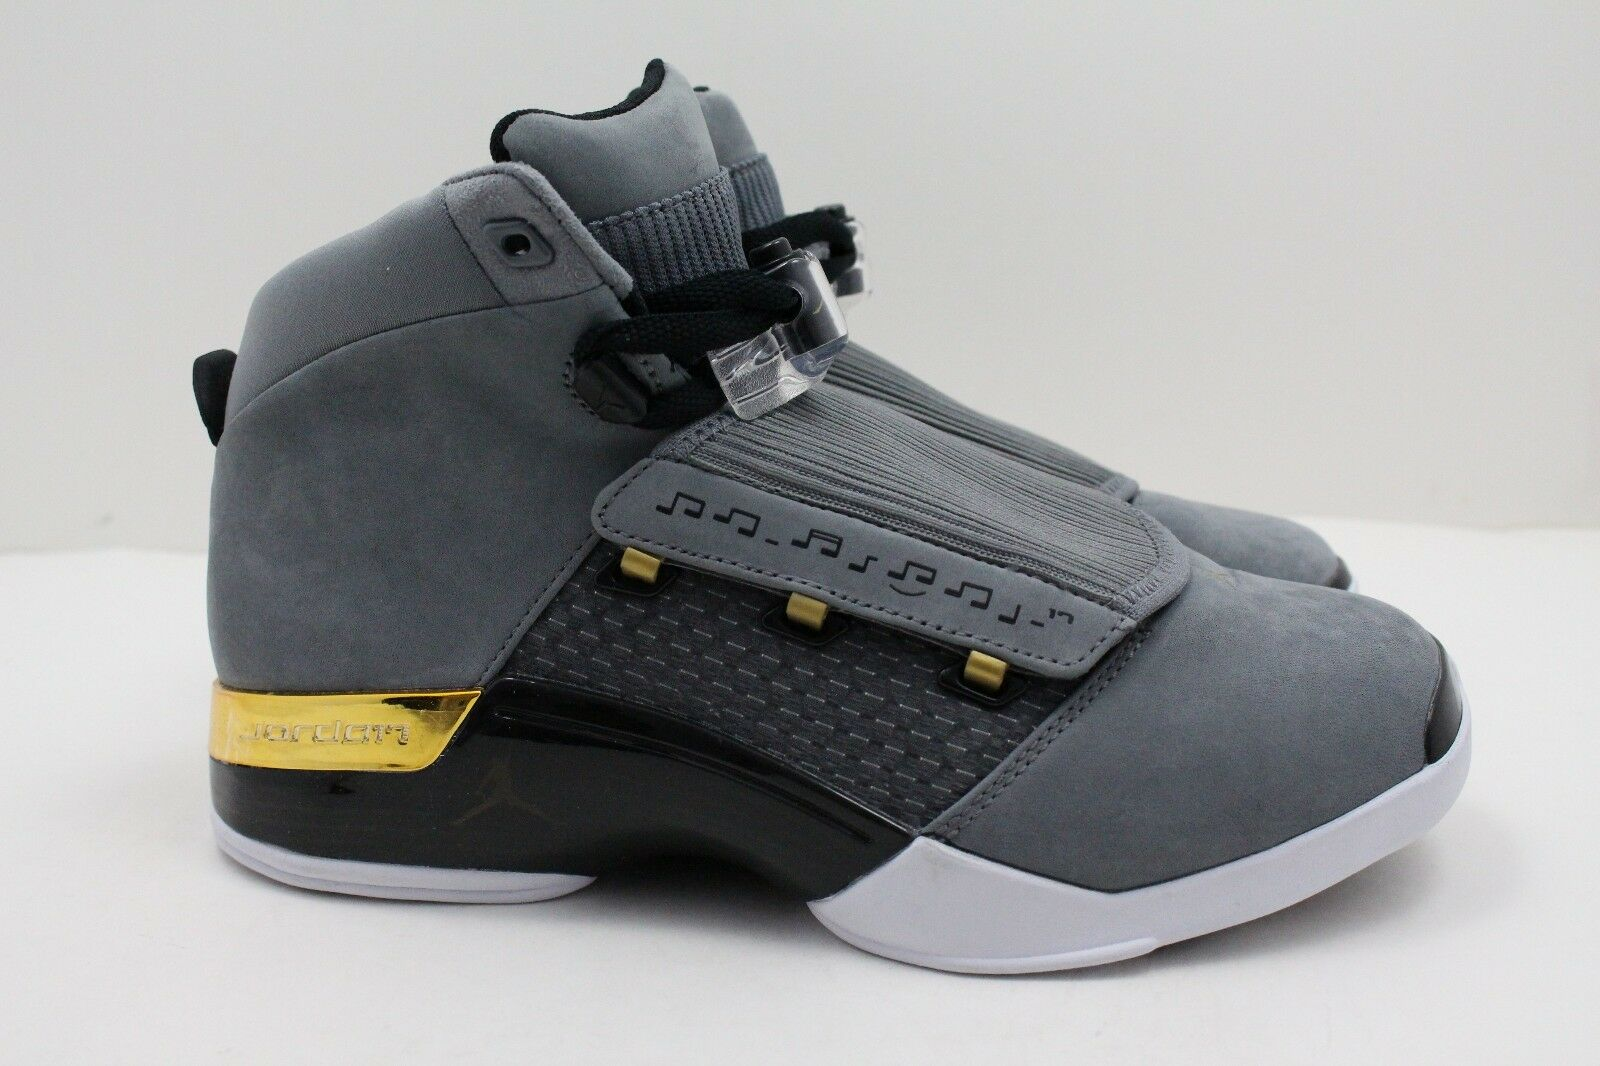 Nike Air Retro Jordan 17 Trophy Room size 7